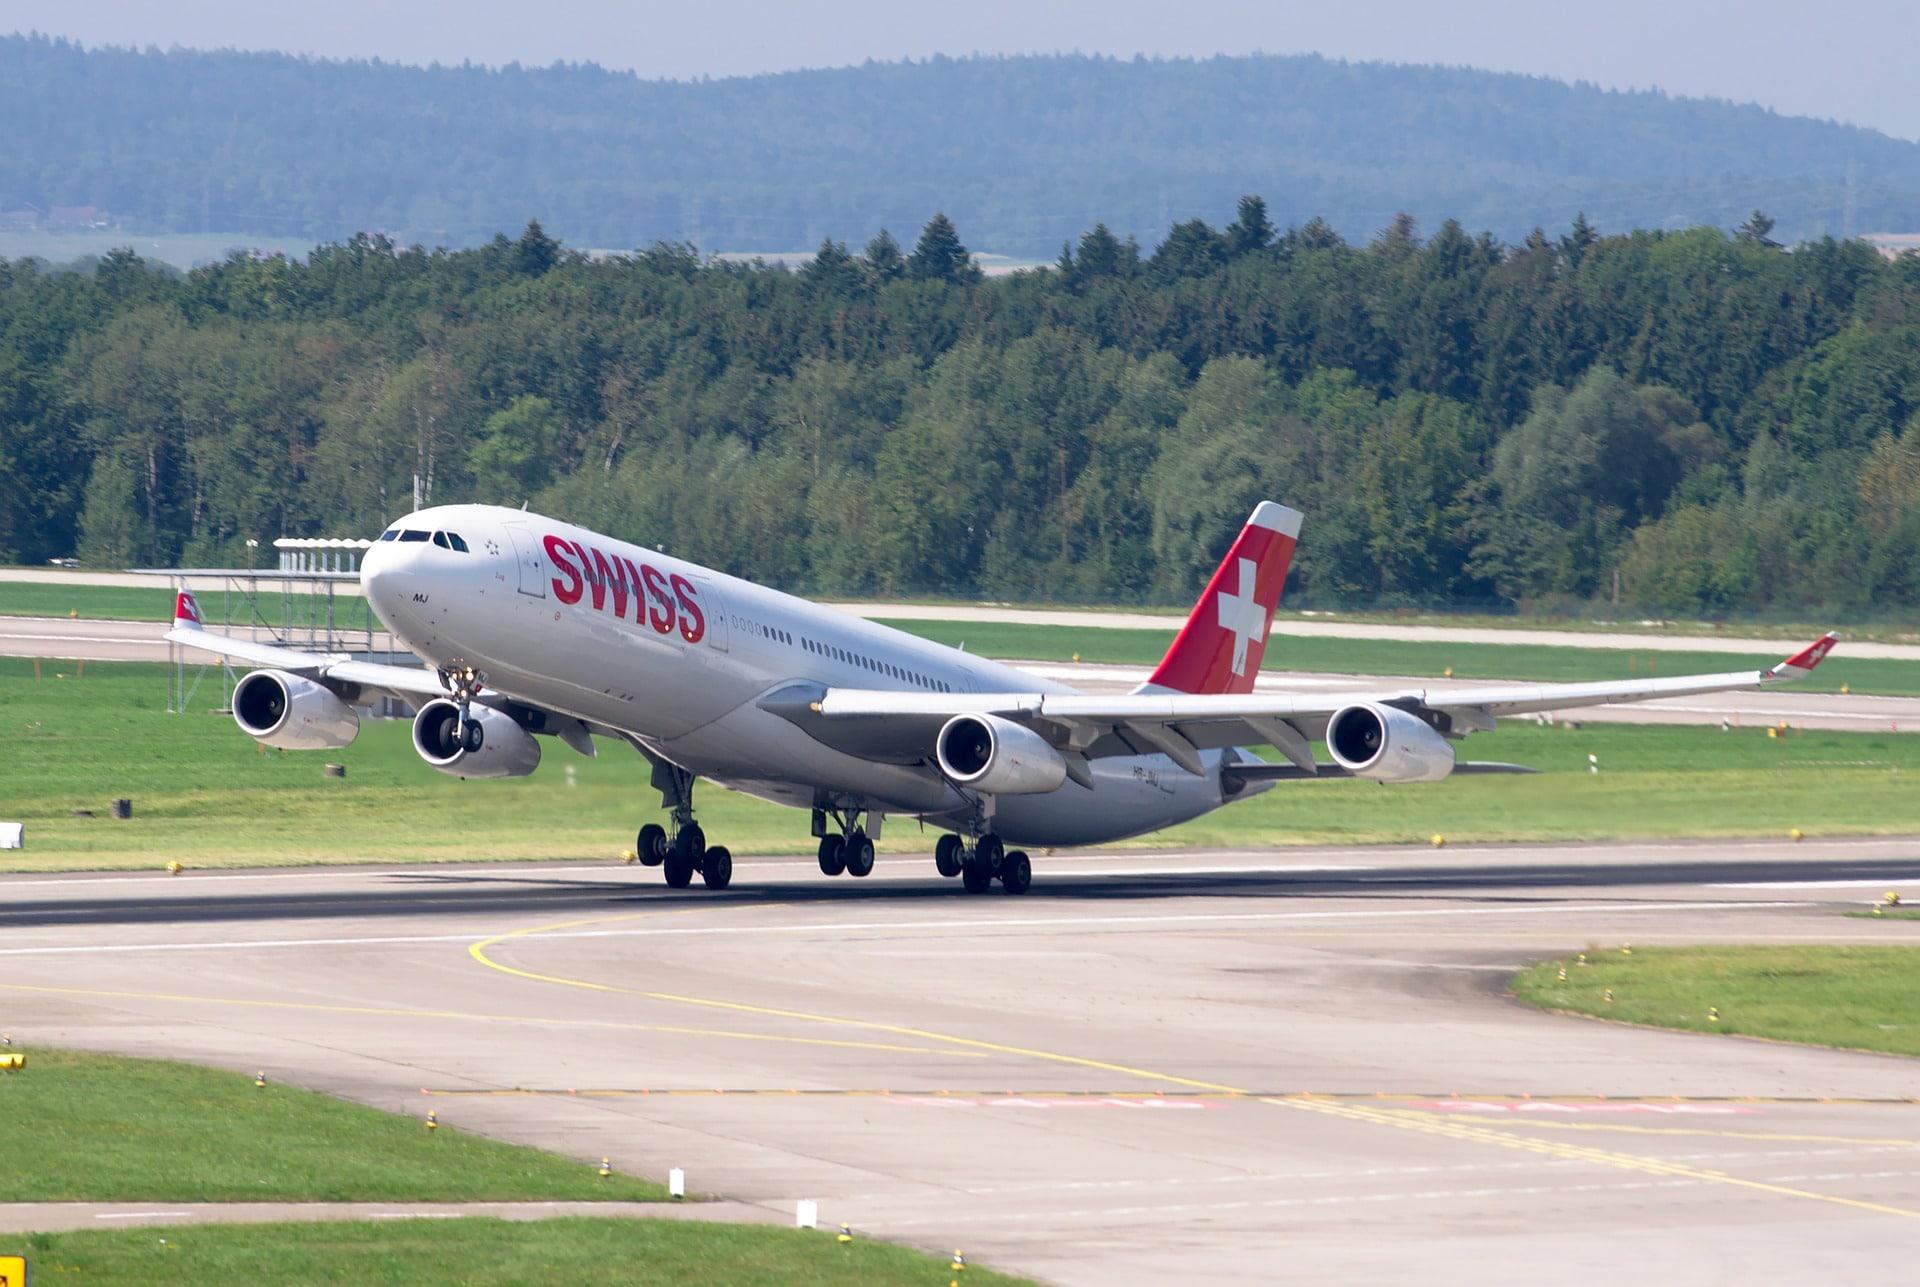 Swiss A 340